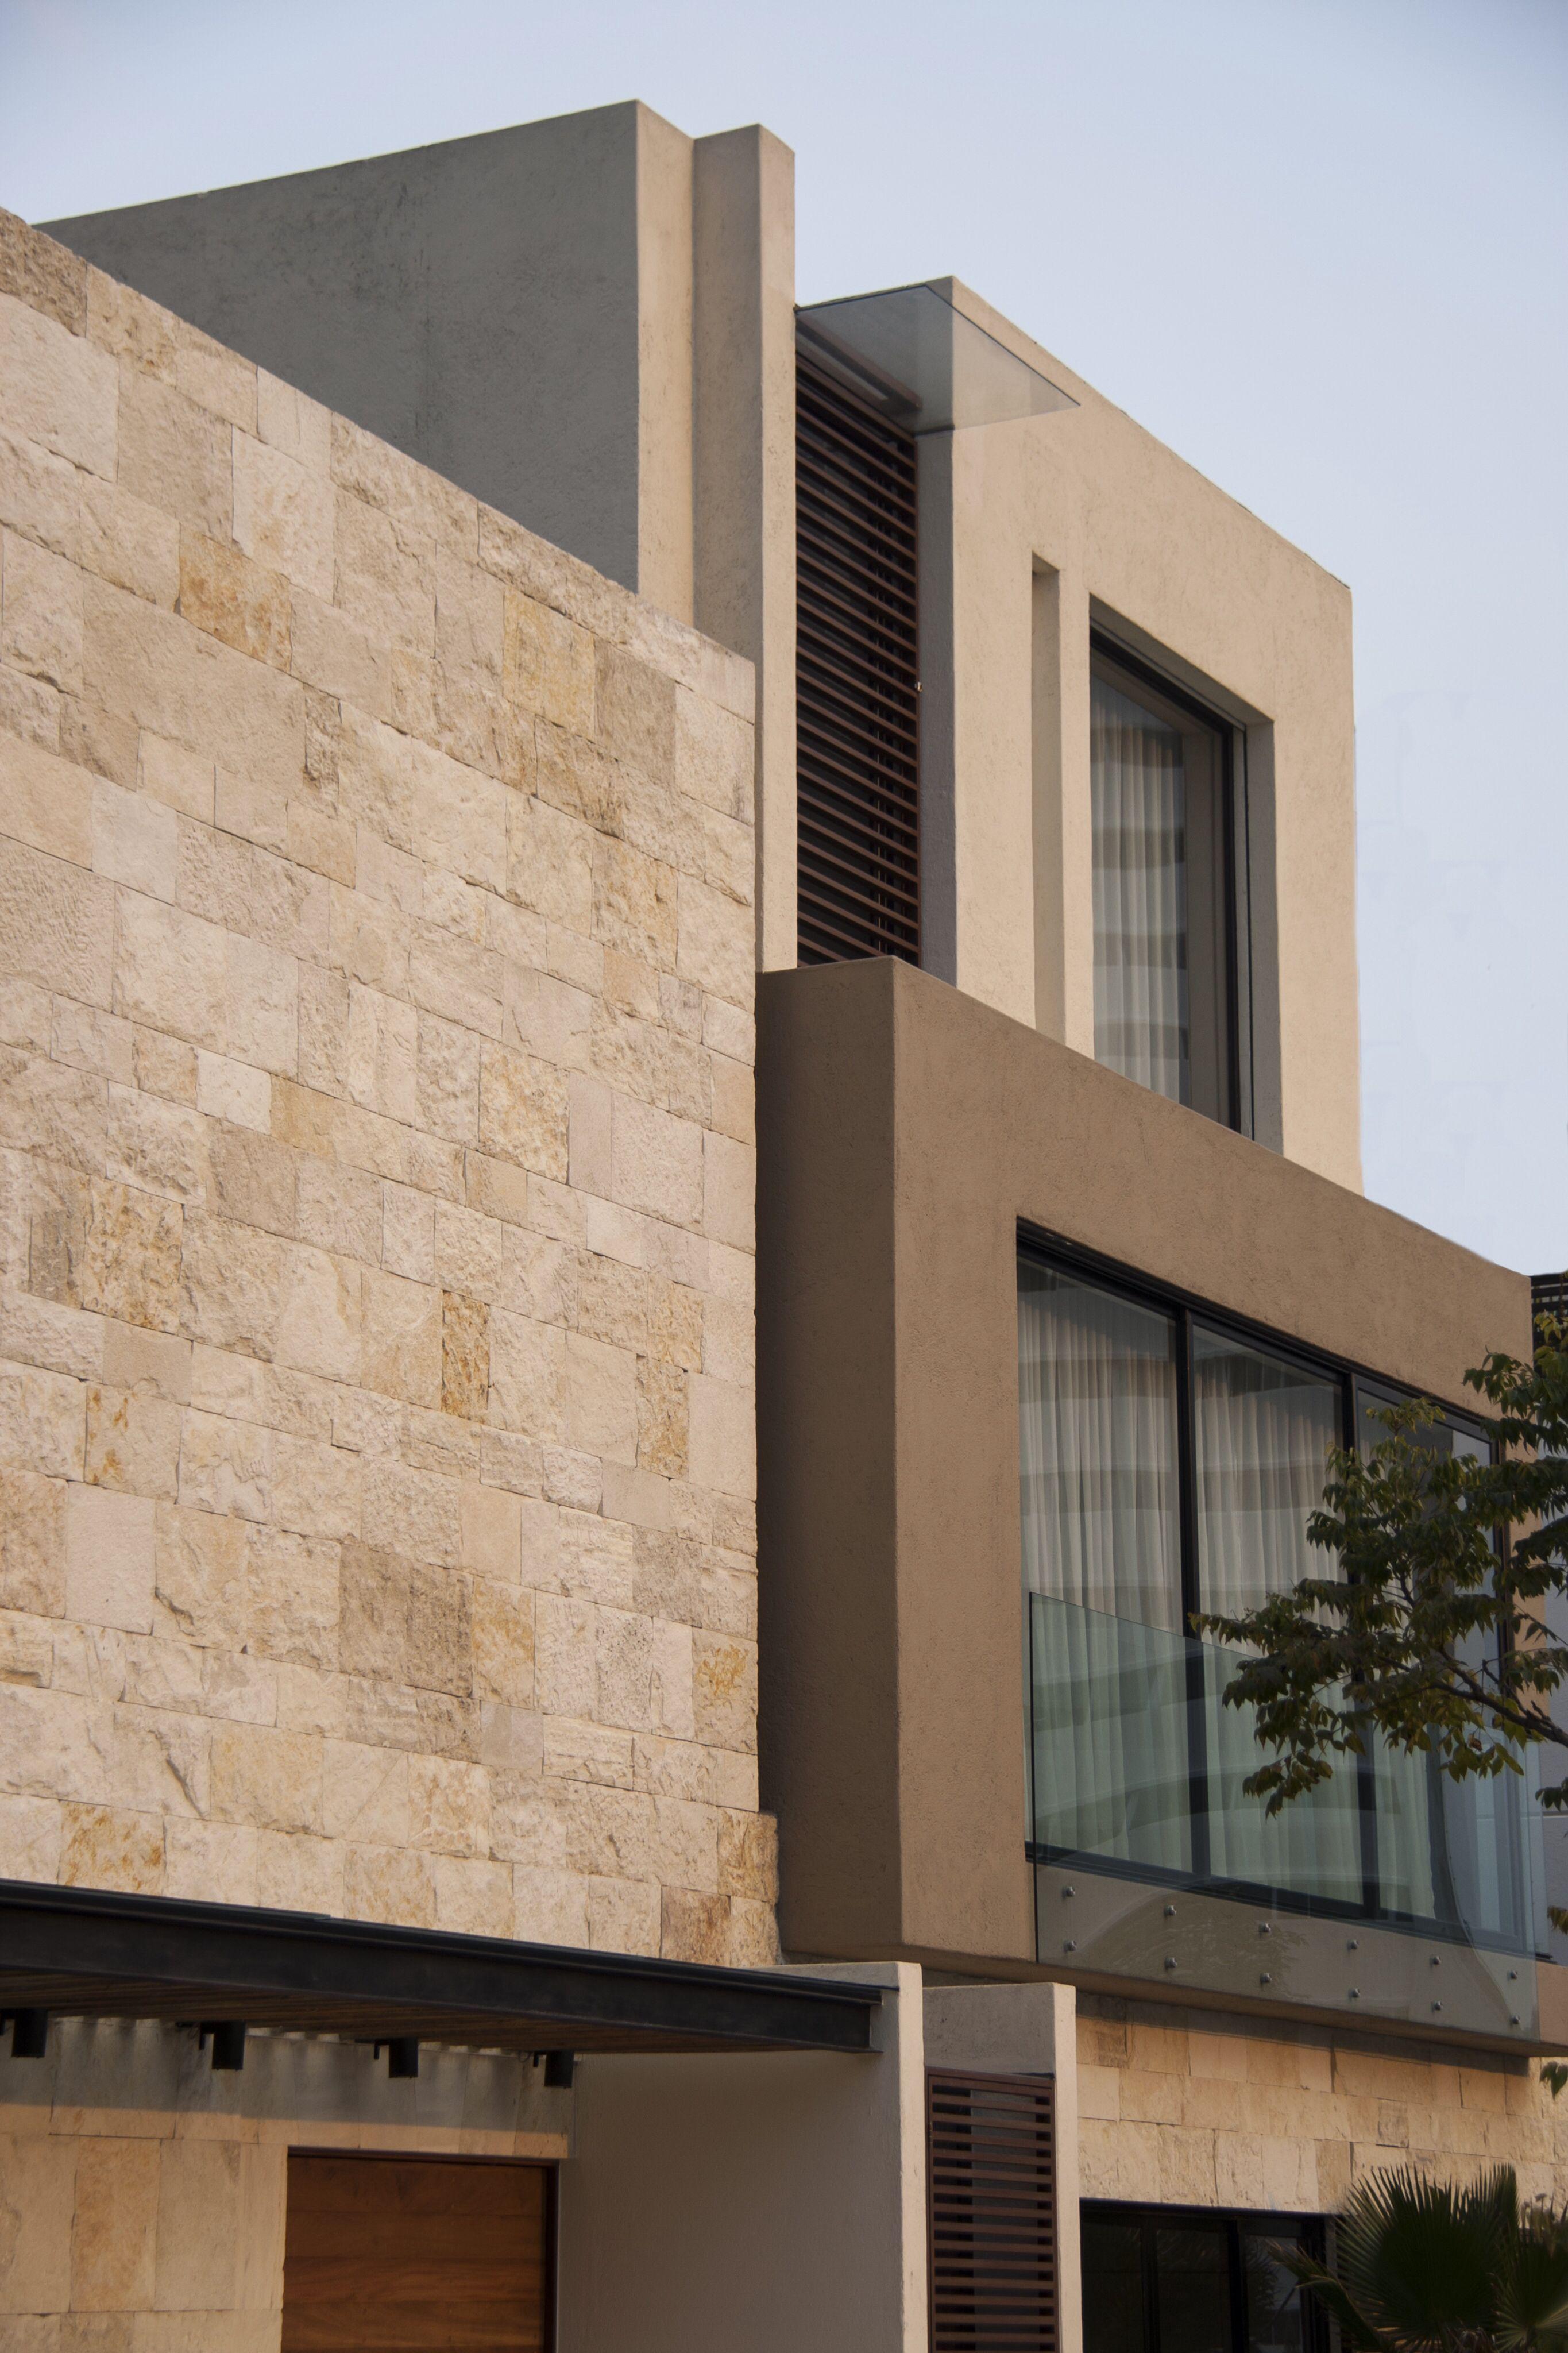 Casa ss fachada muros de piedra canceleria de for Piedras para fachadas minimalistas